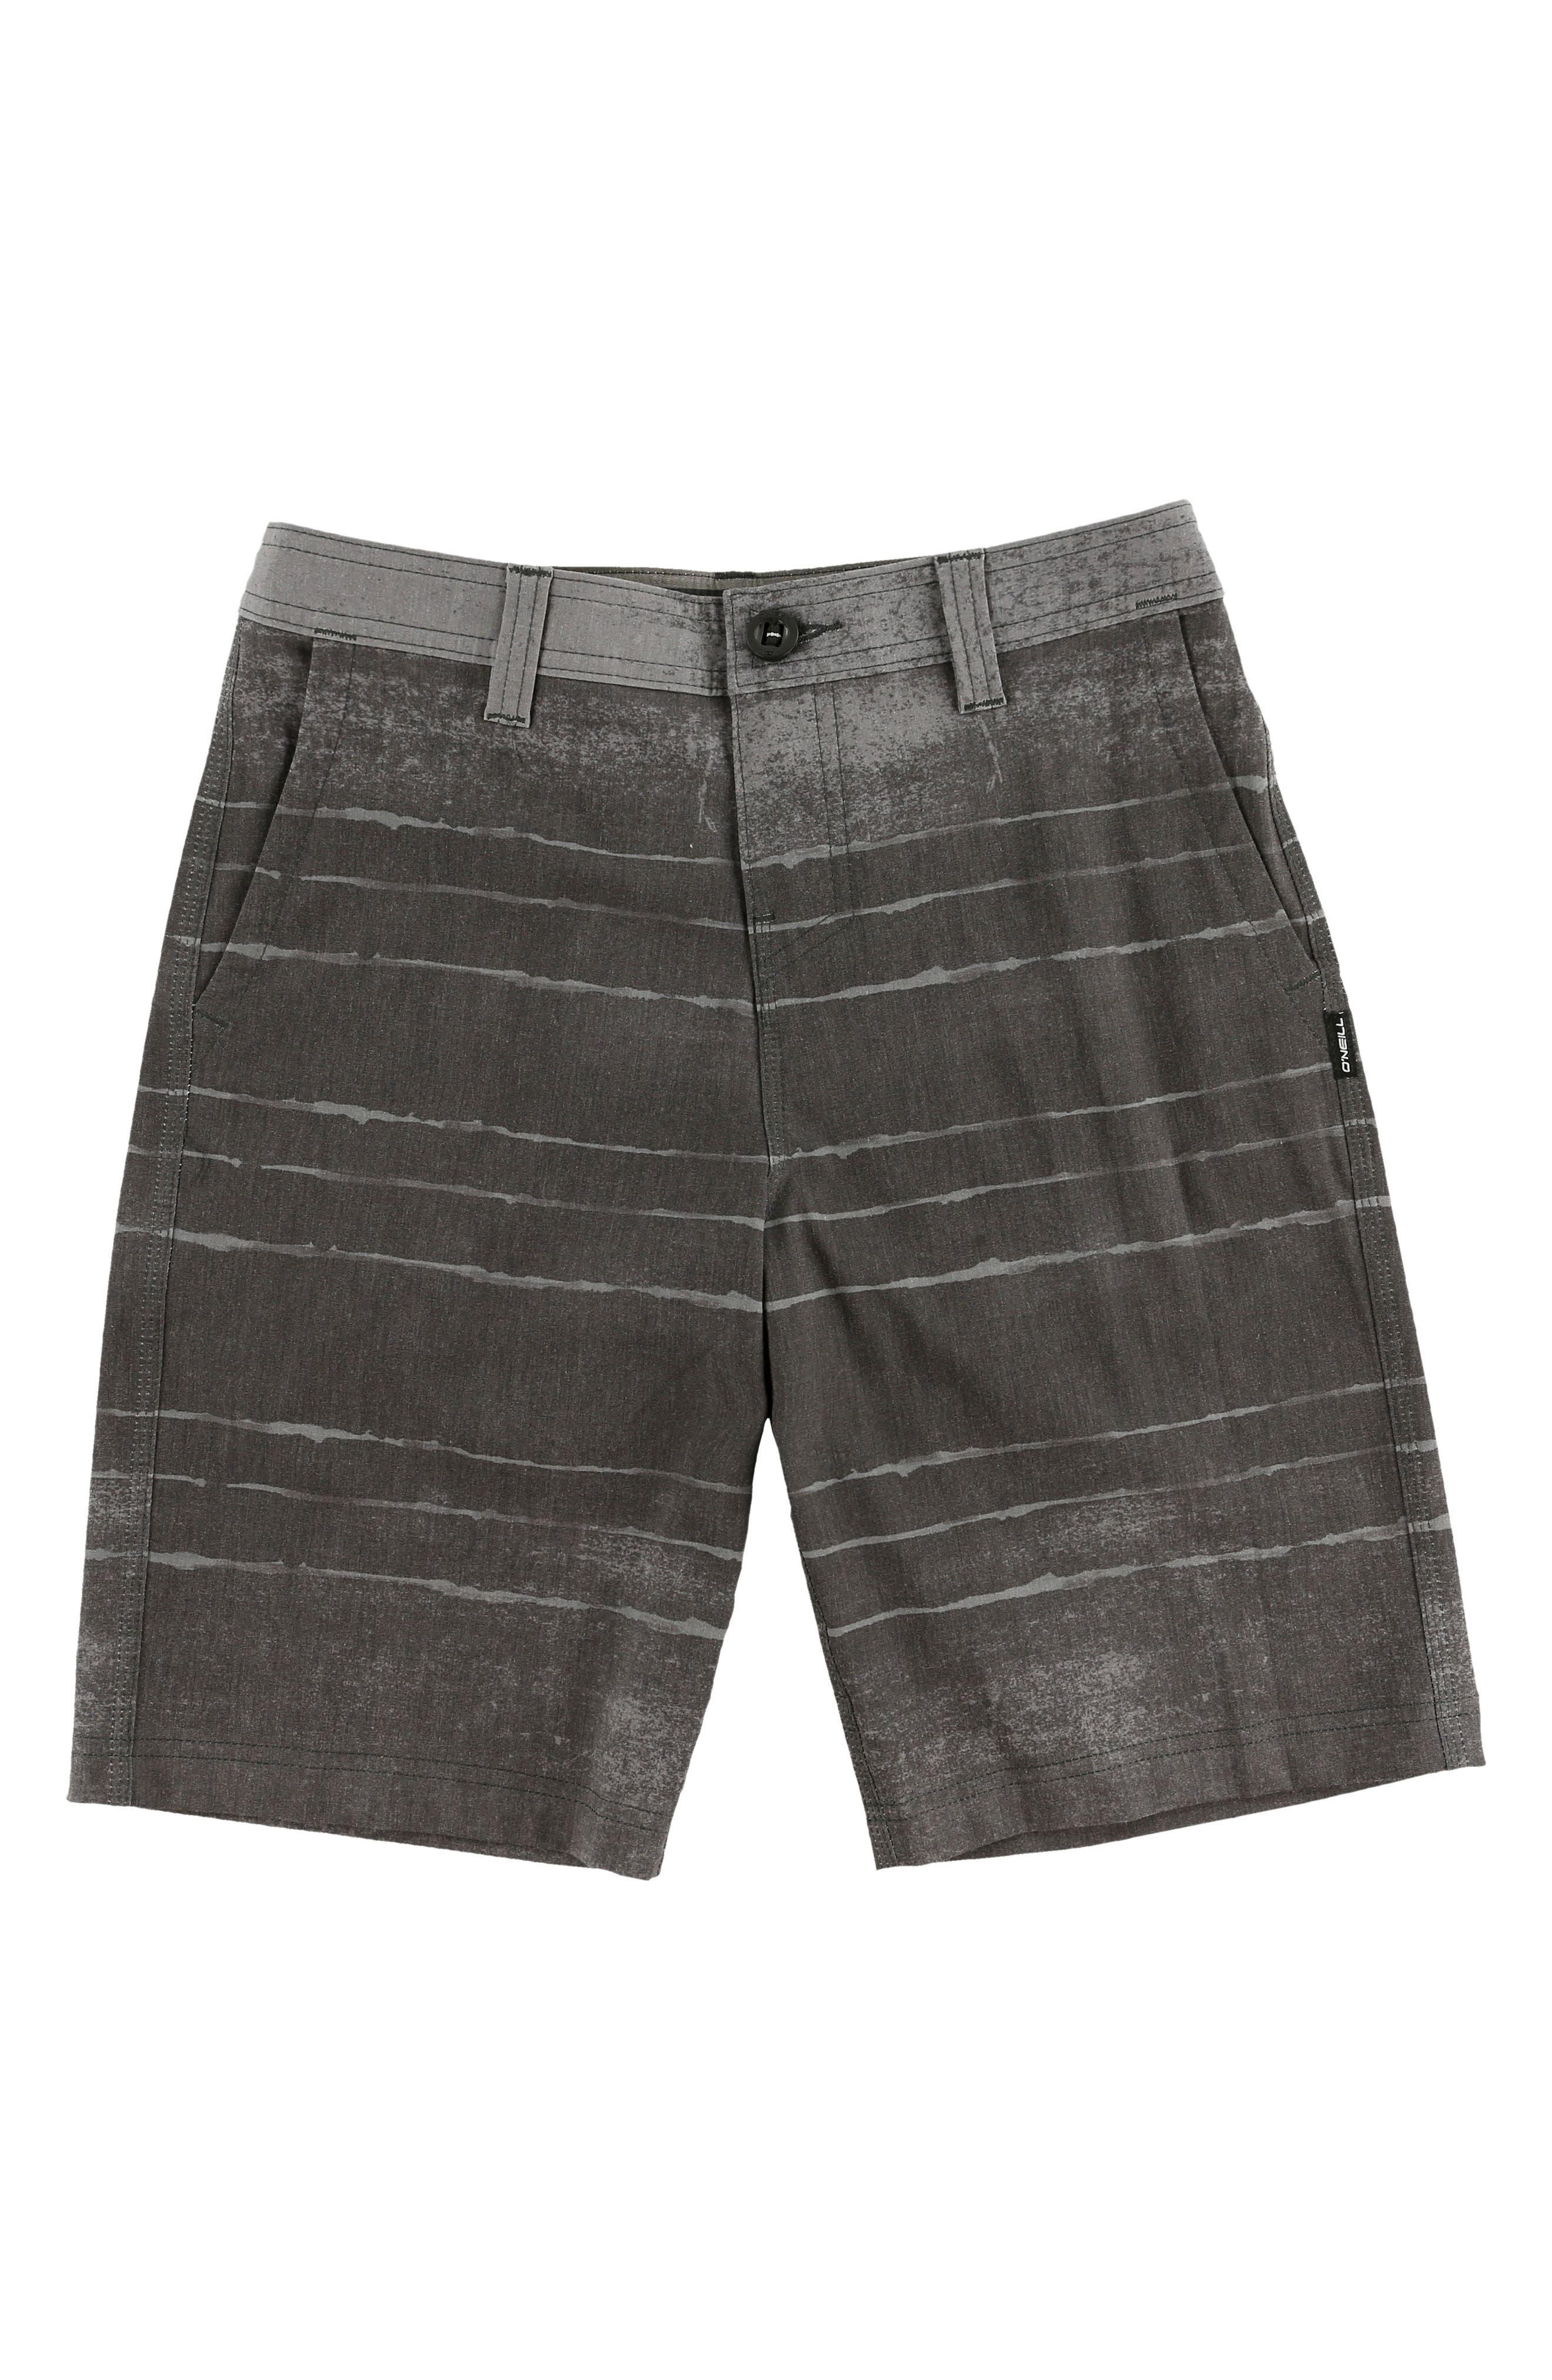 O'NEILL,                             Tye Striper Hybrid Shorts,                             Main thumbnail 1, color,                             ASPHALT